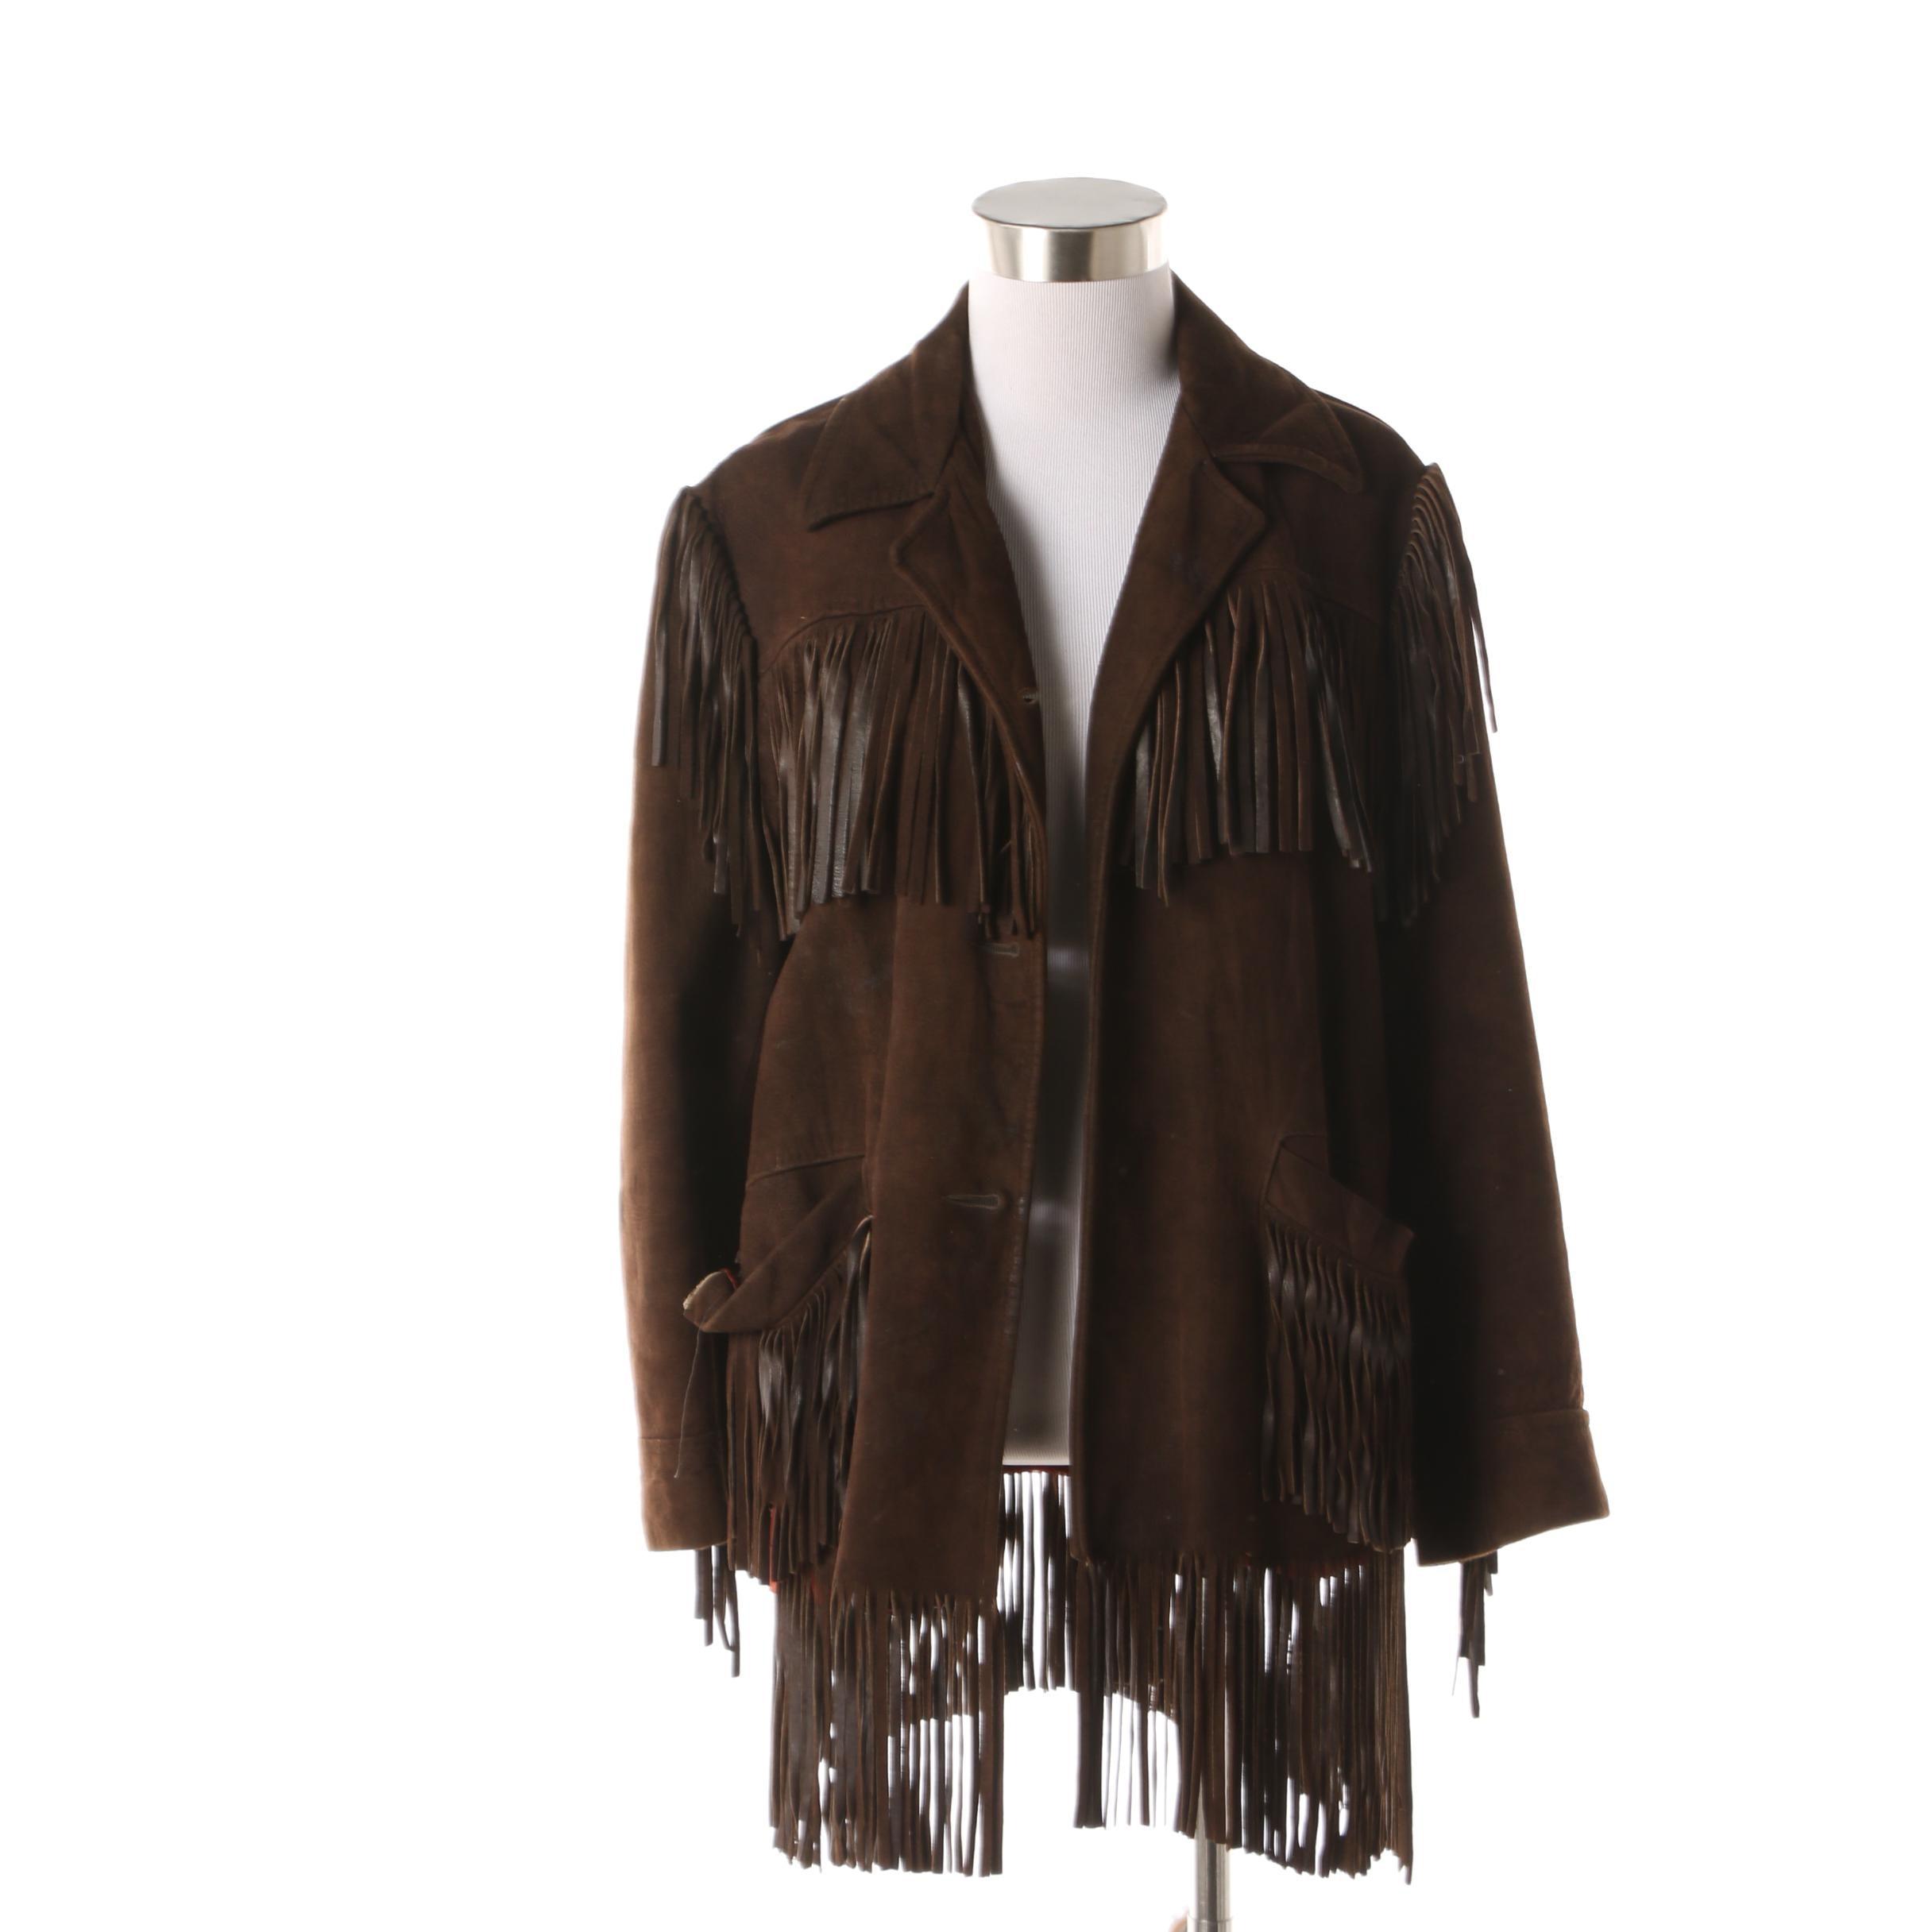 Women's 1970s Vintage Dark Brown Suede Fringe Jacket